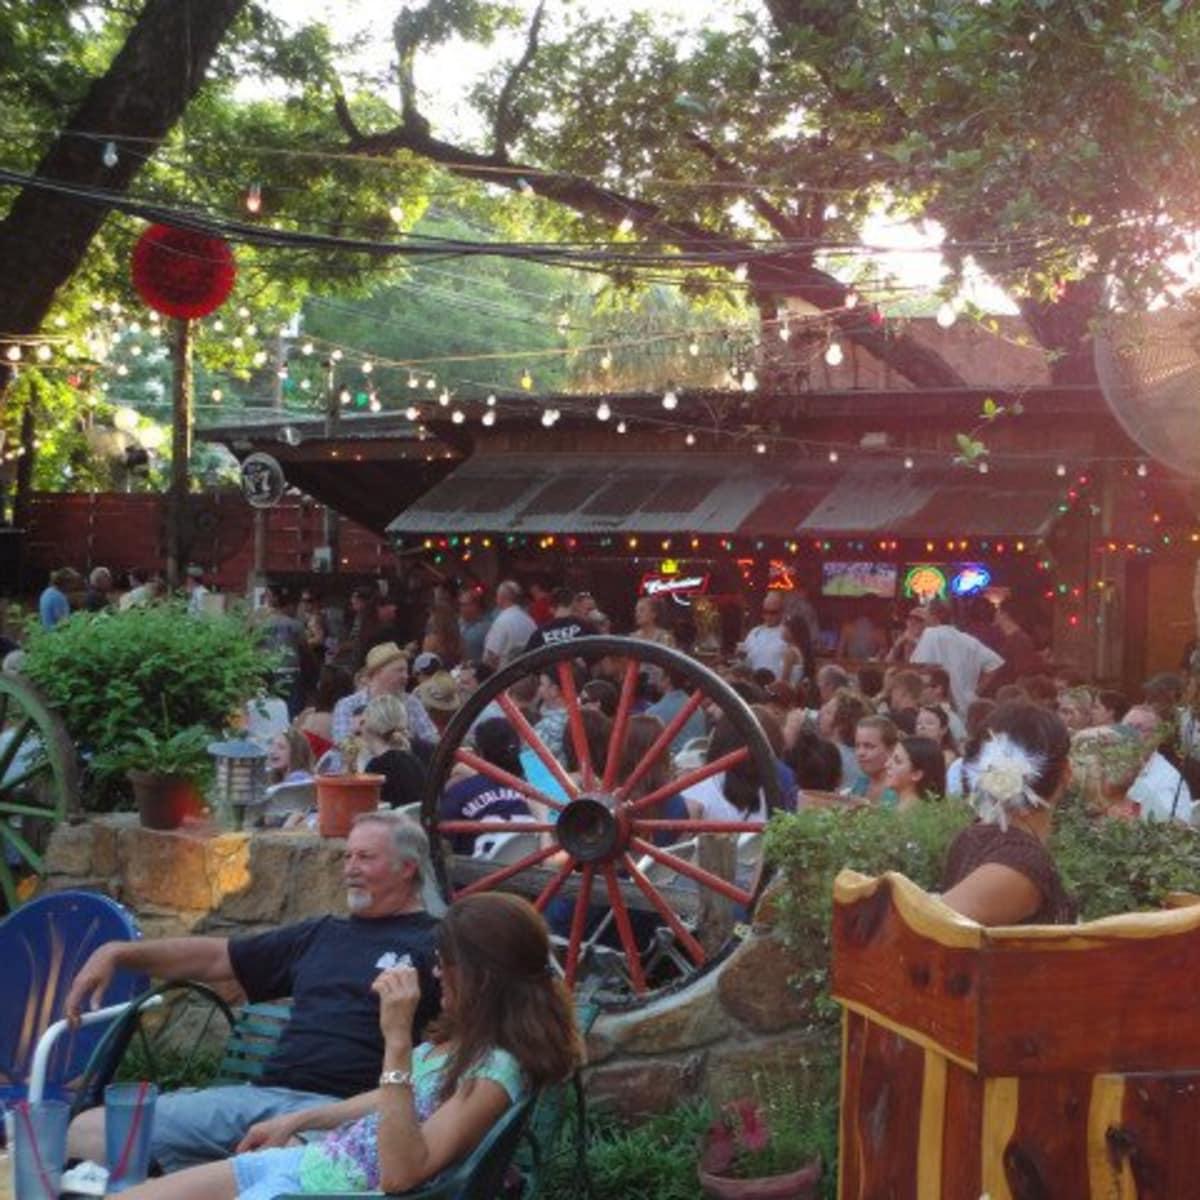 austin photo set: news_july_arden_unplugged at grove